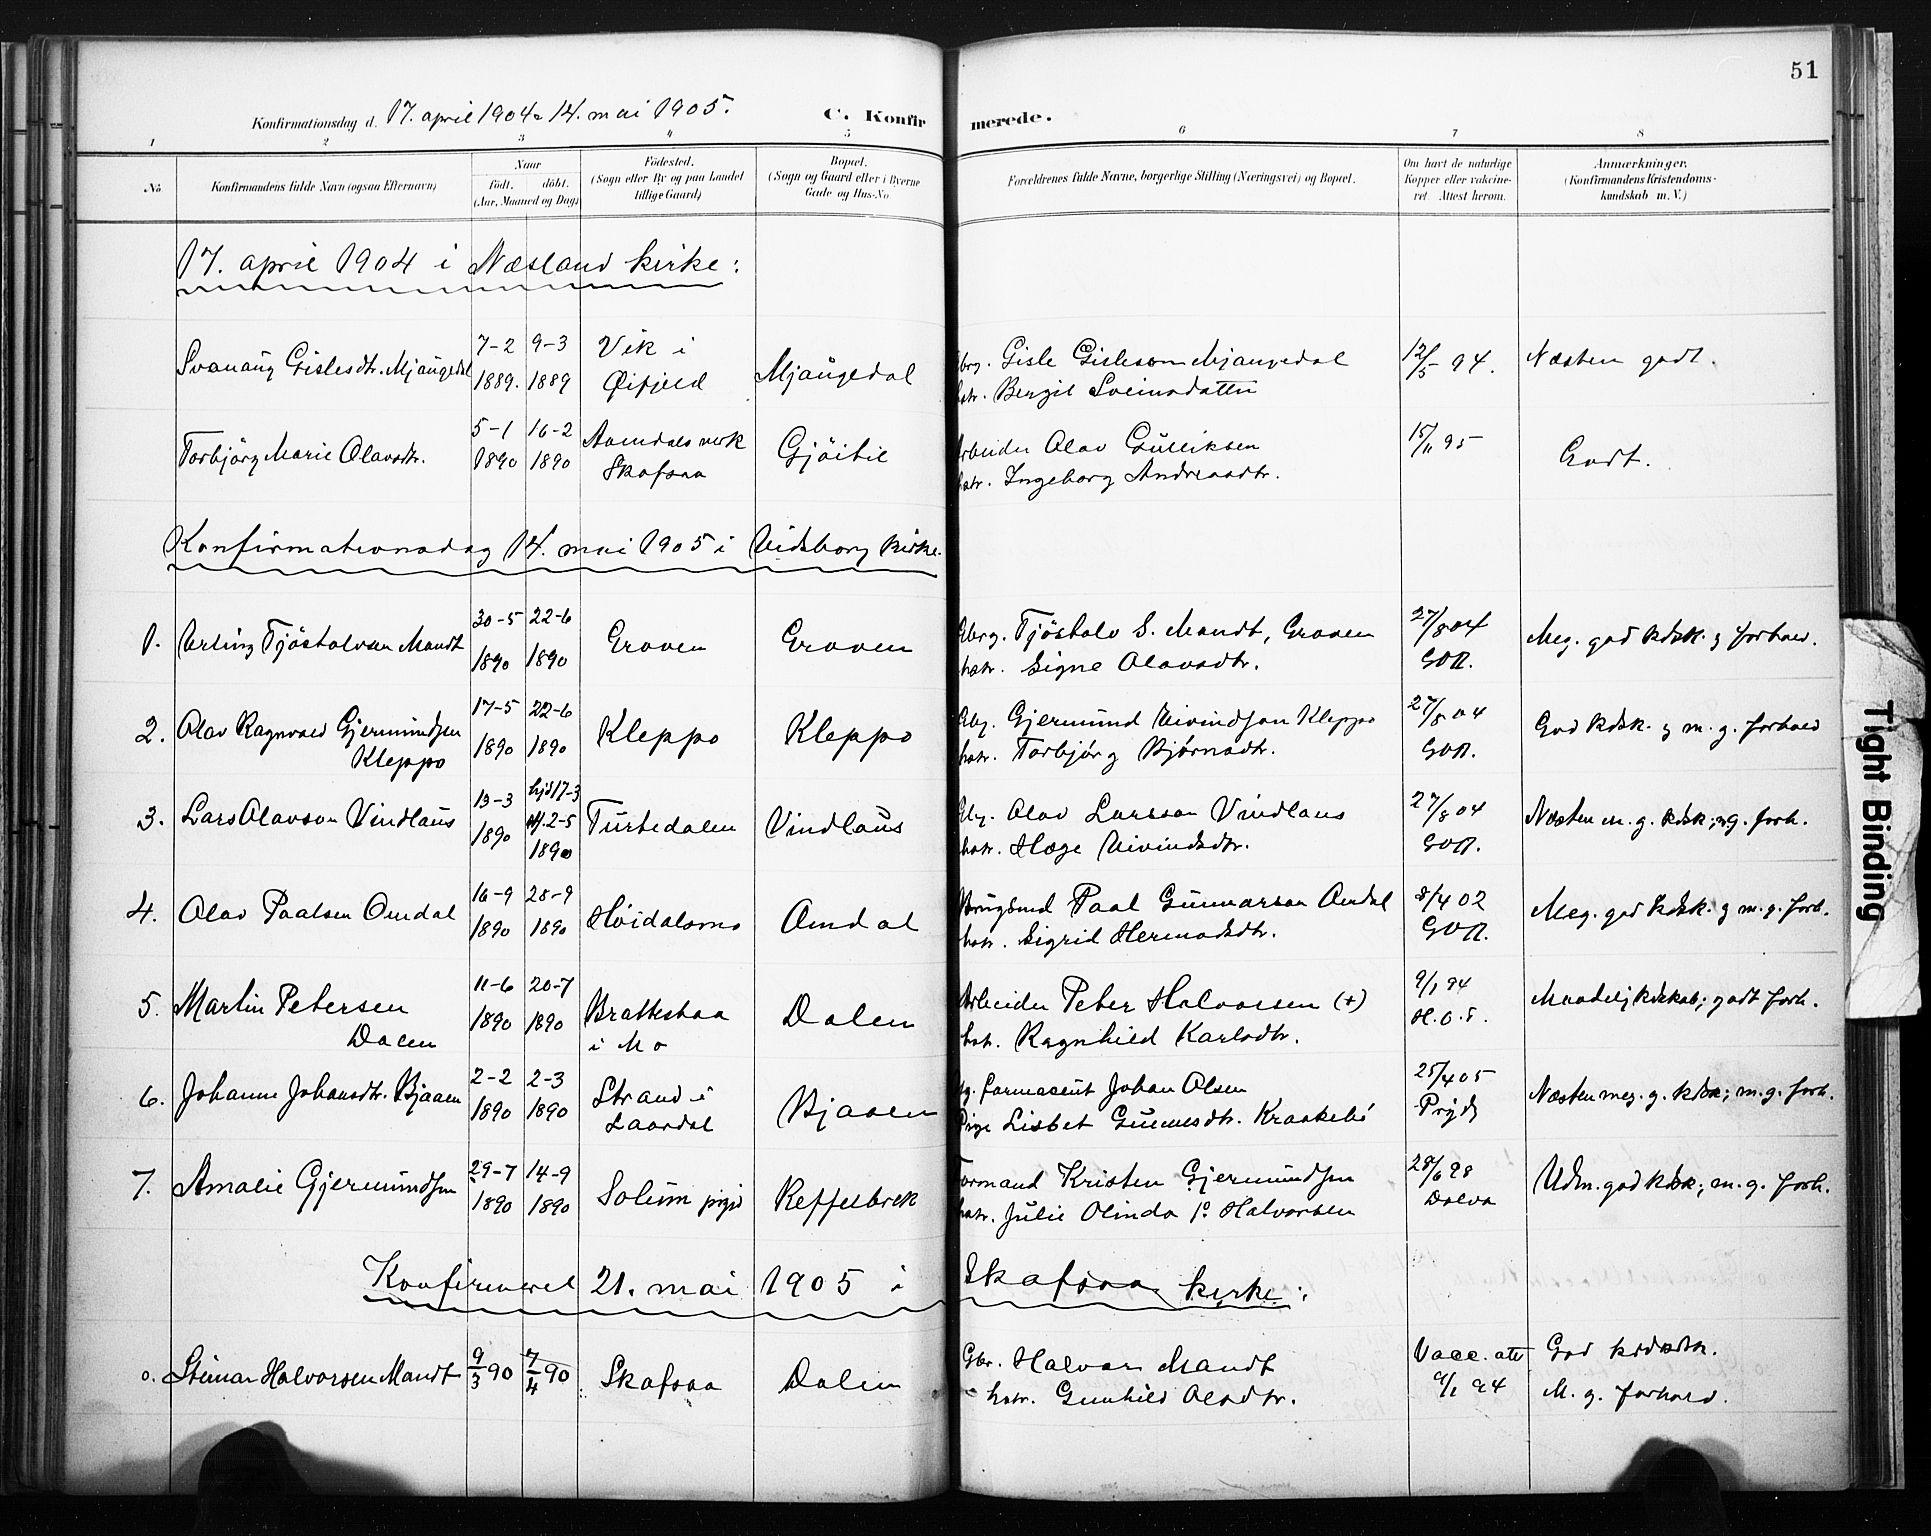 SAKO, Lårdal kirkebøker, F/Fb/L0002: Ministerialbok nr. II 2, 1887-1918, s. 51